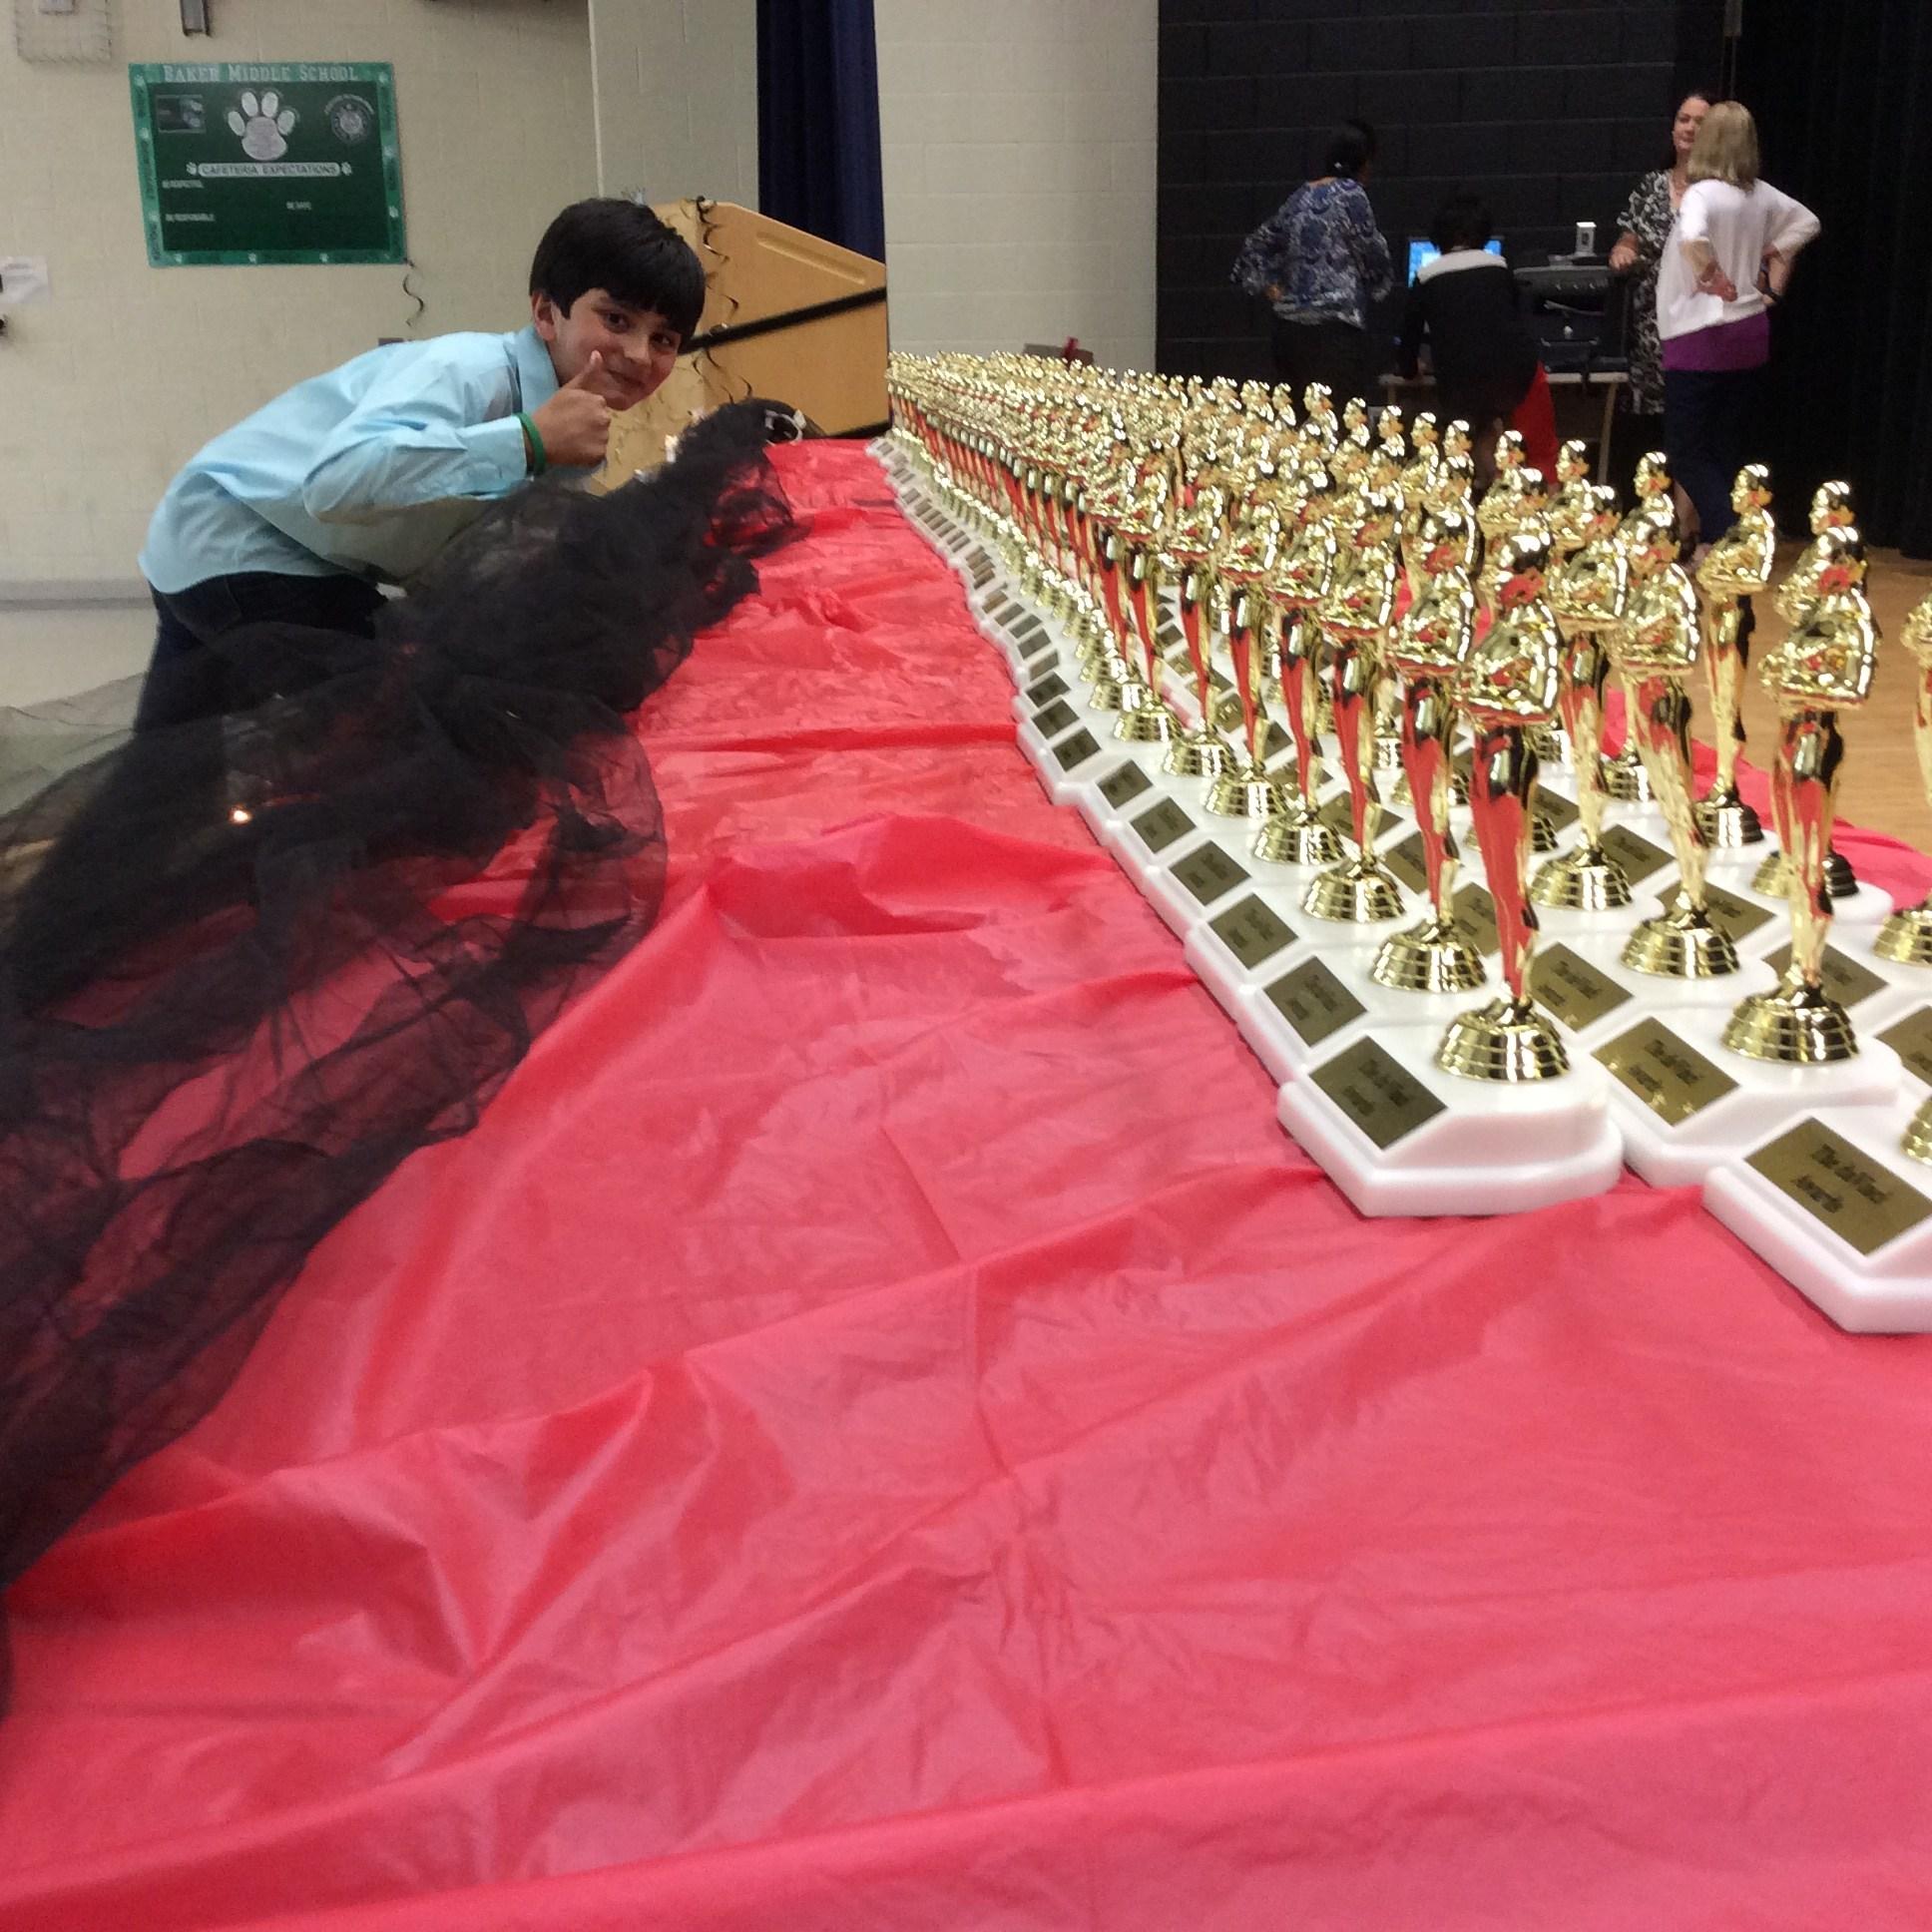 DaVinci Trophys